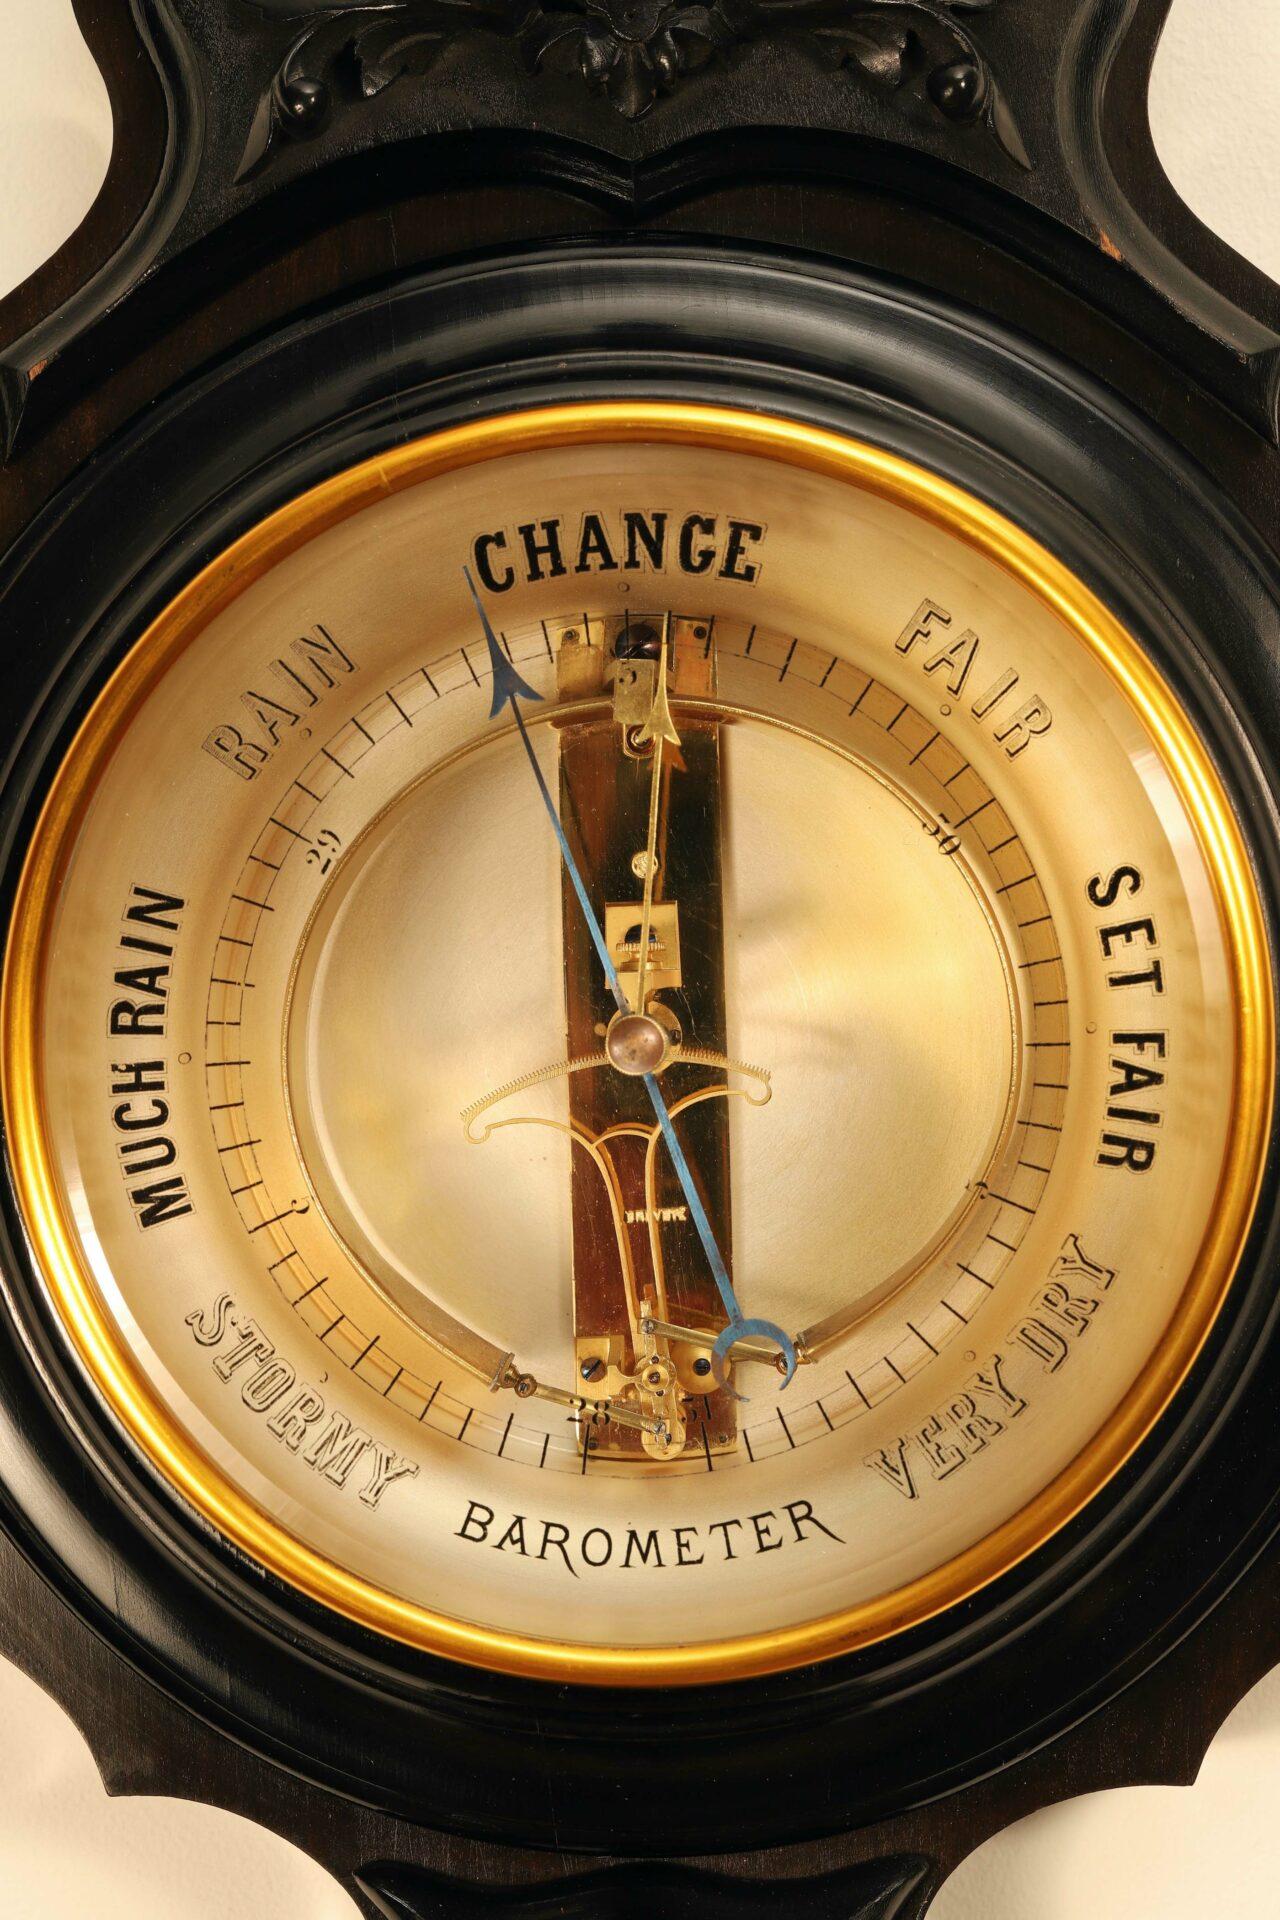 Image of dial from Jules Richard Bourdon Barometer No 45028 c1900